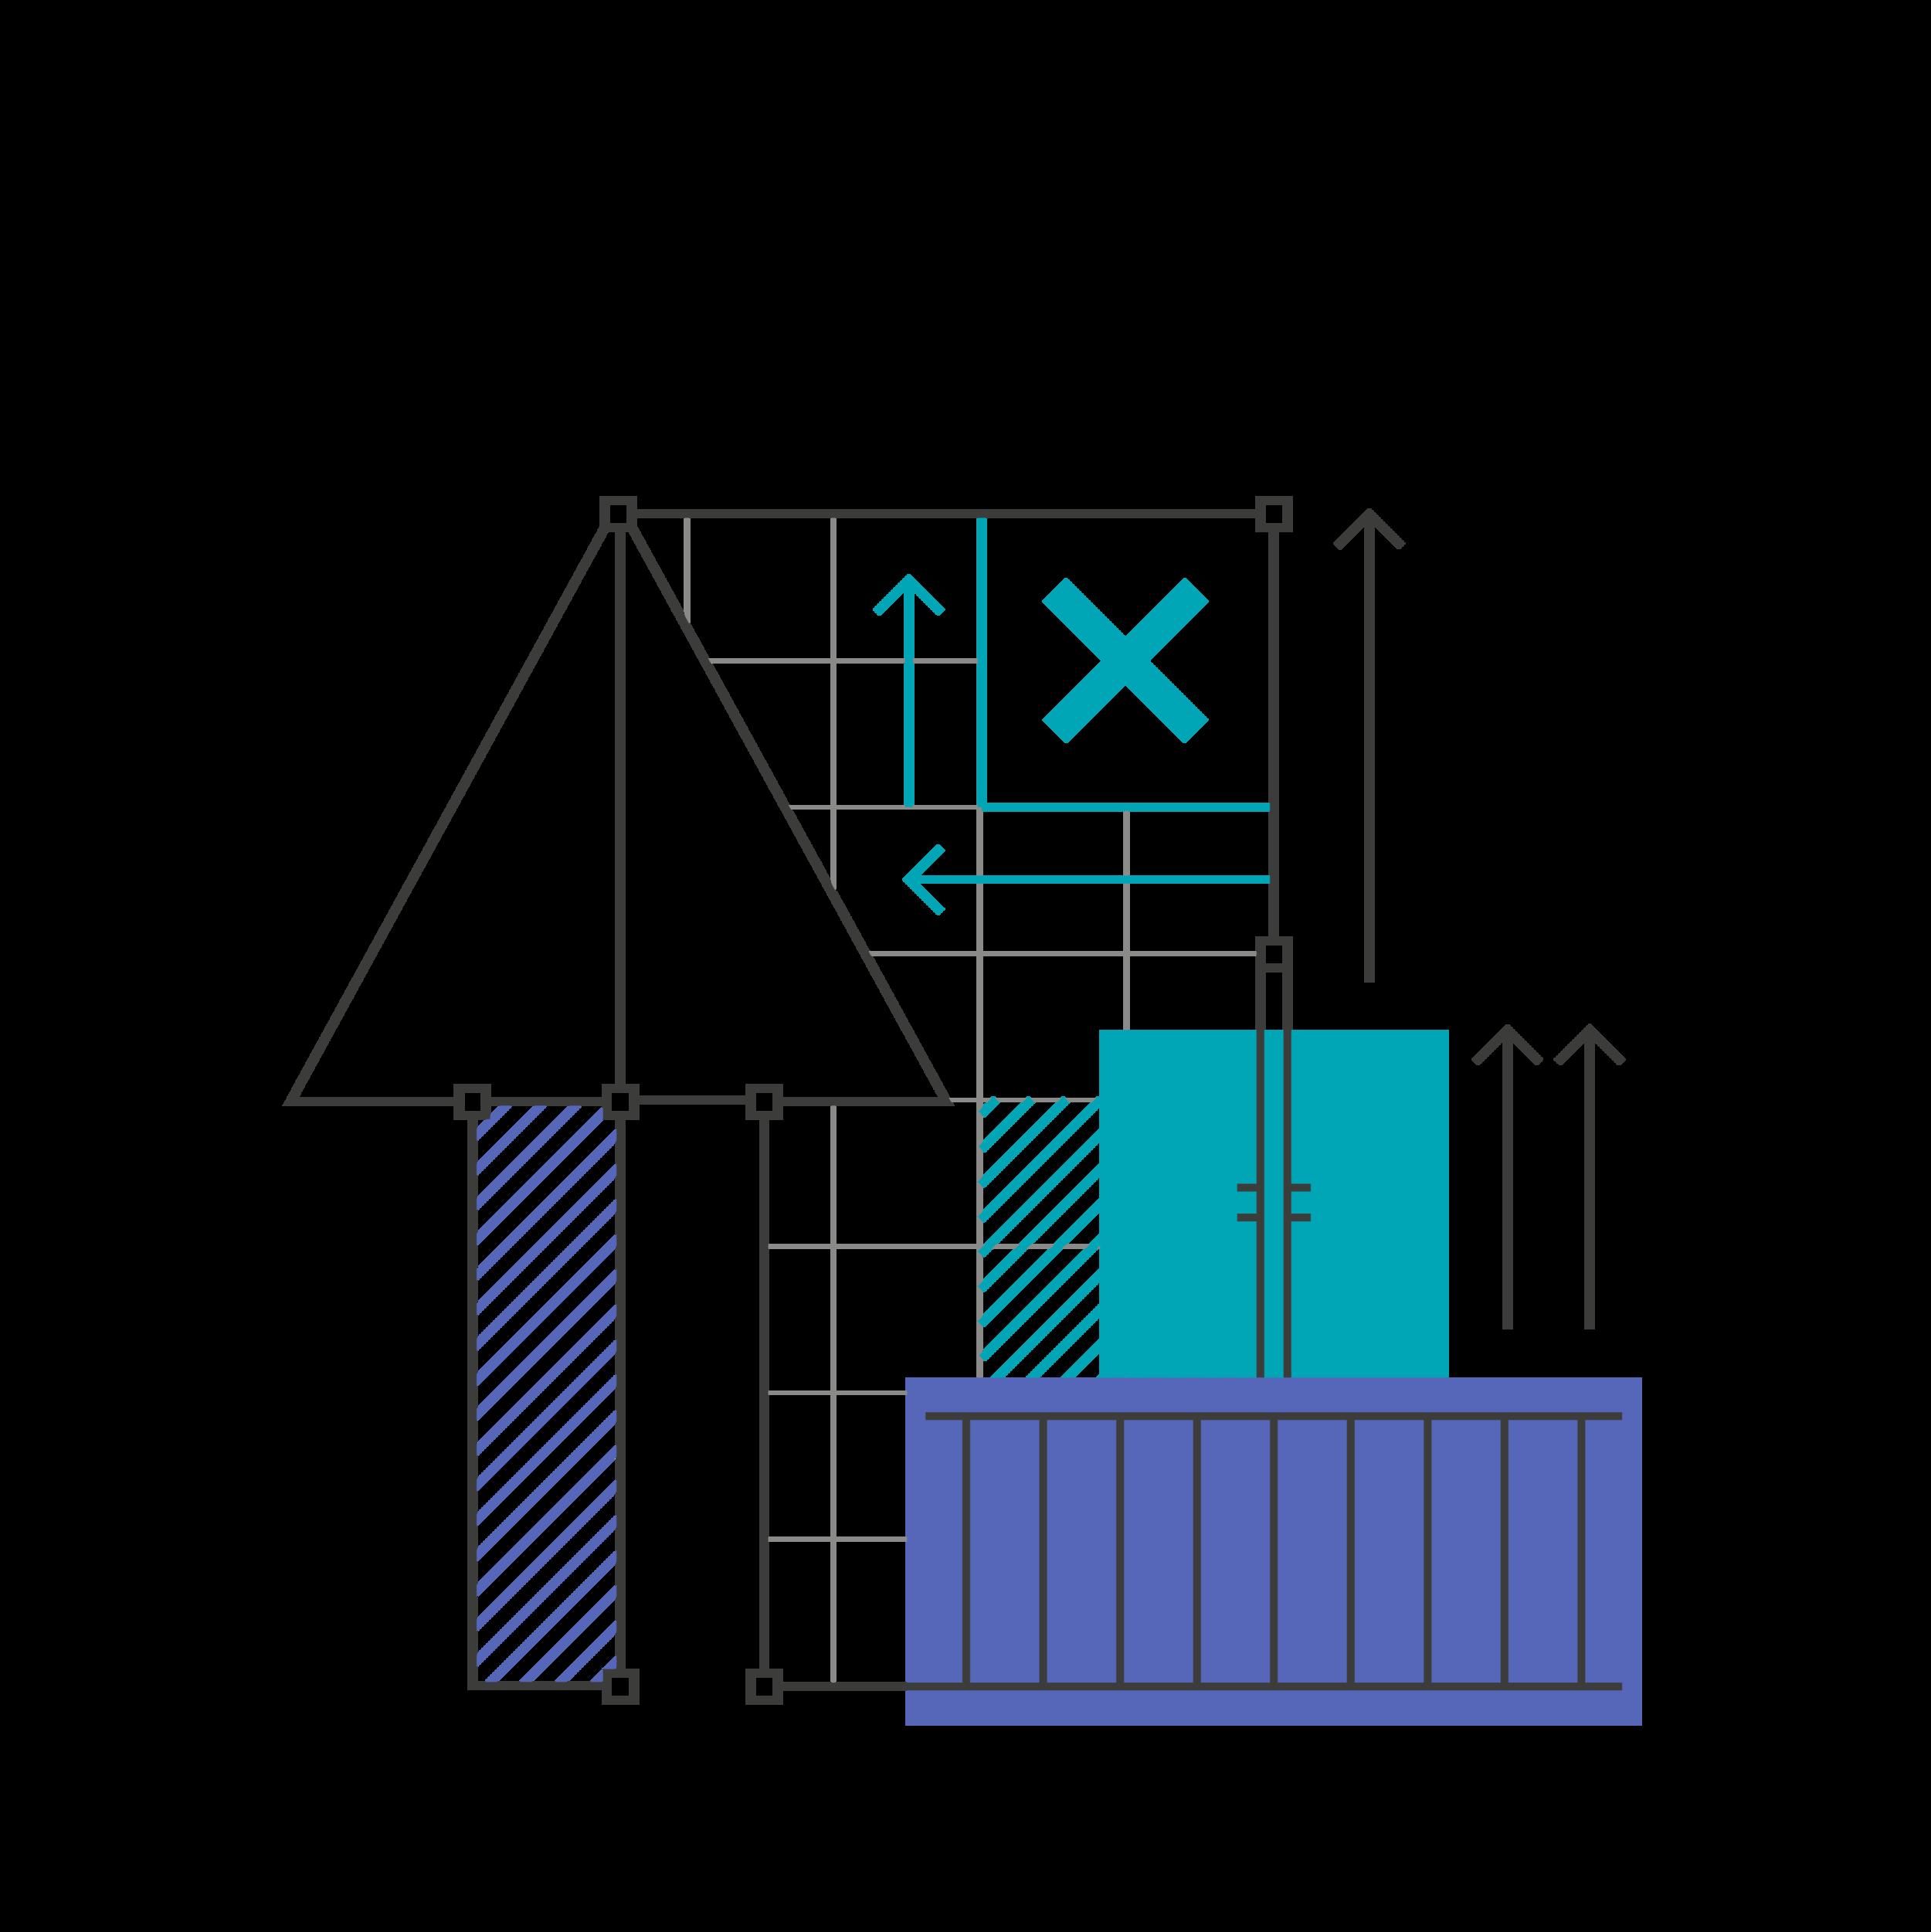 Autepra_web_ikonos_Determine position copy.png